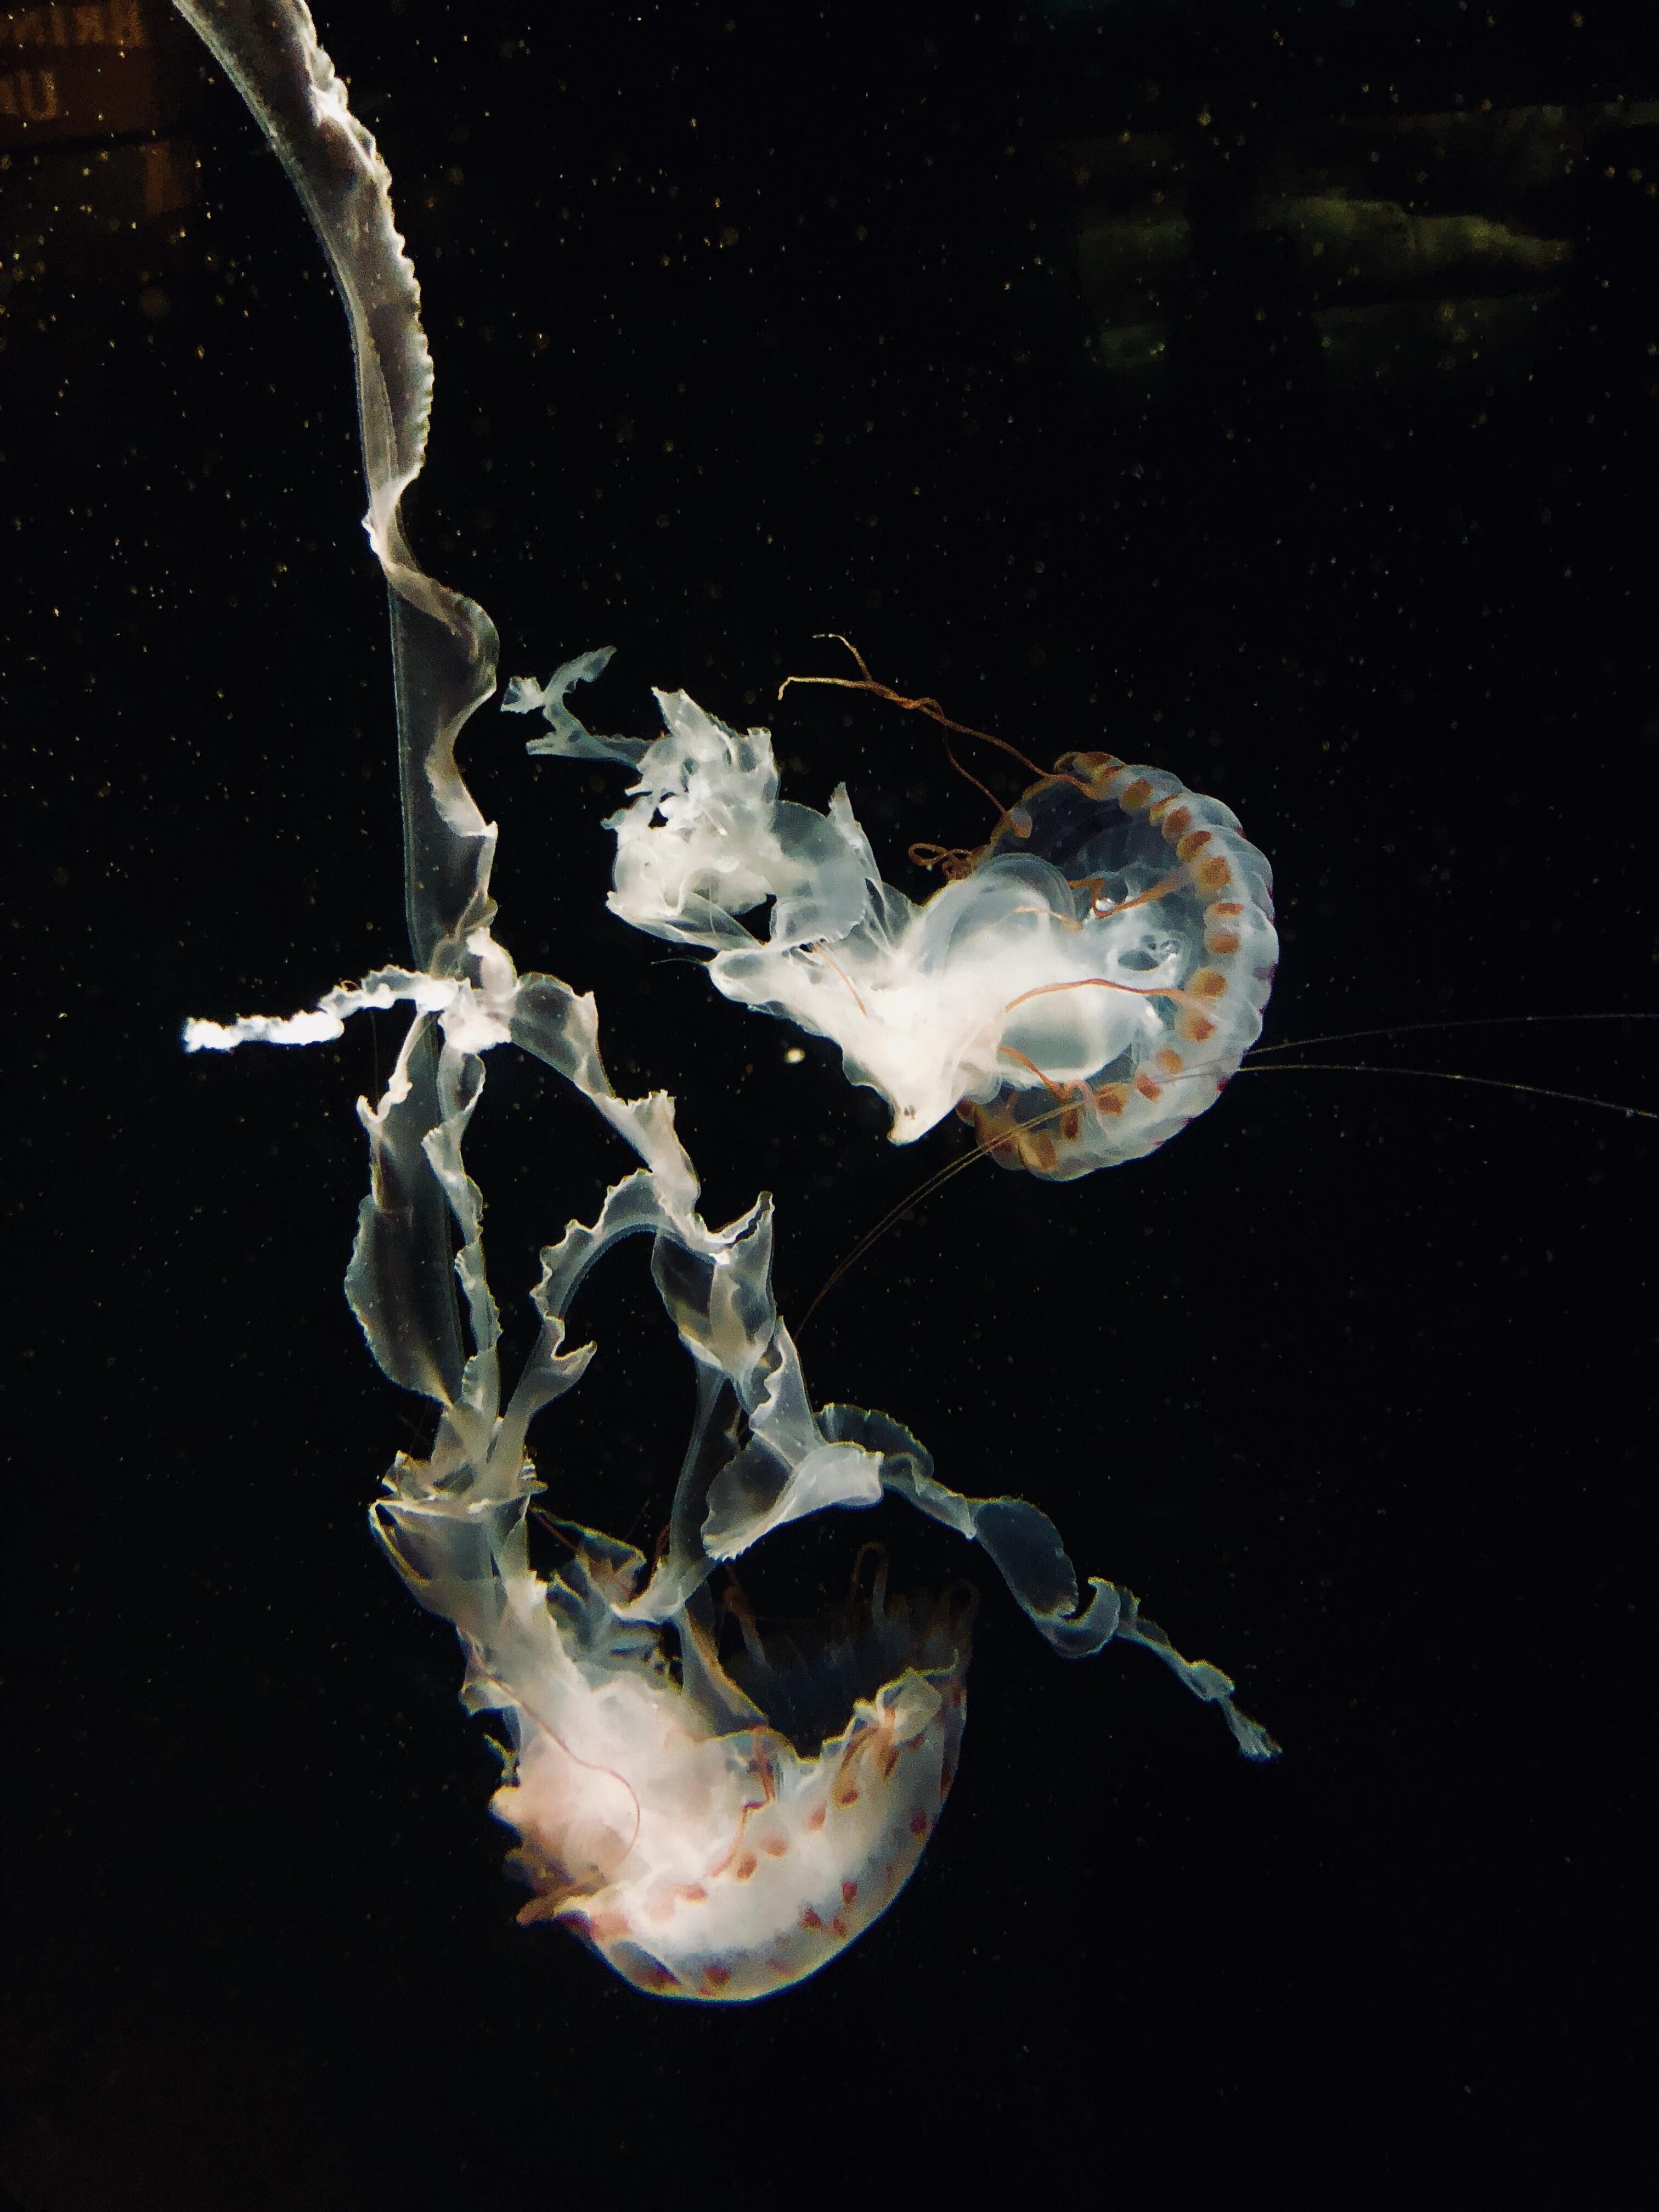 Jelly Fish Wallpaper - Jellyfish , HD Wallpaper & Backgrounds